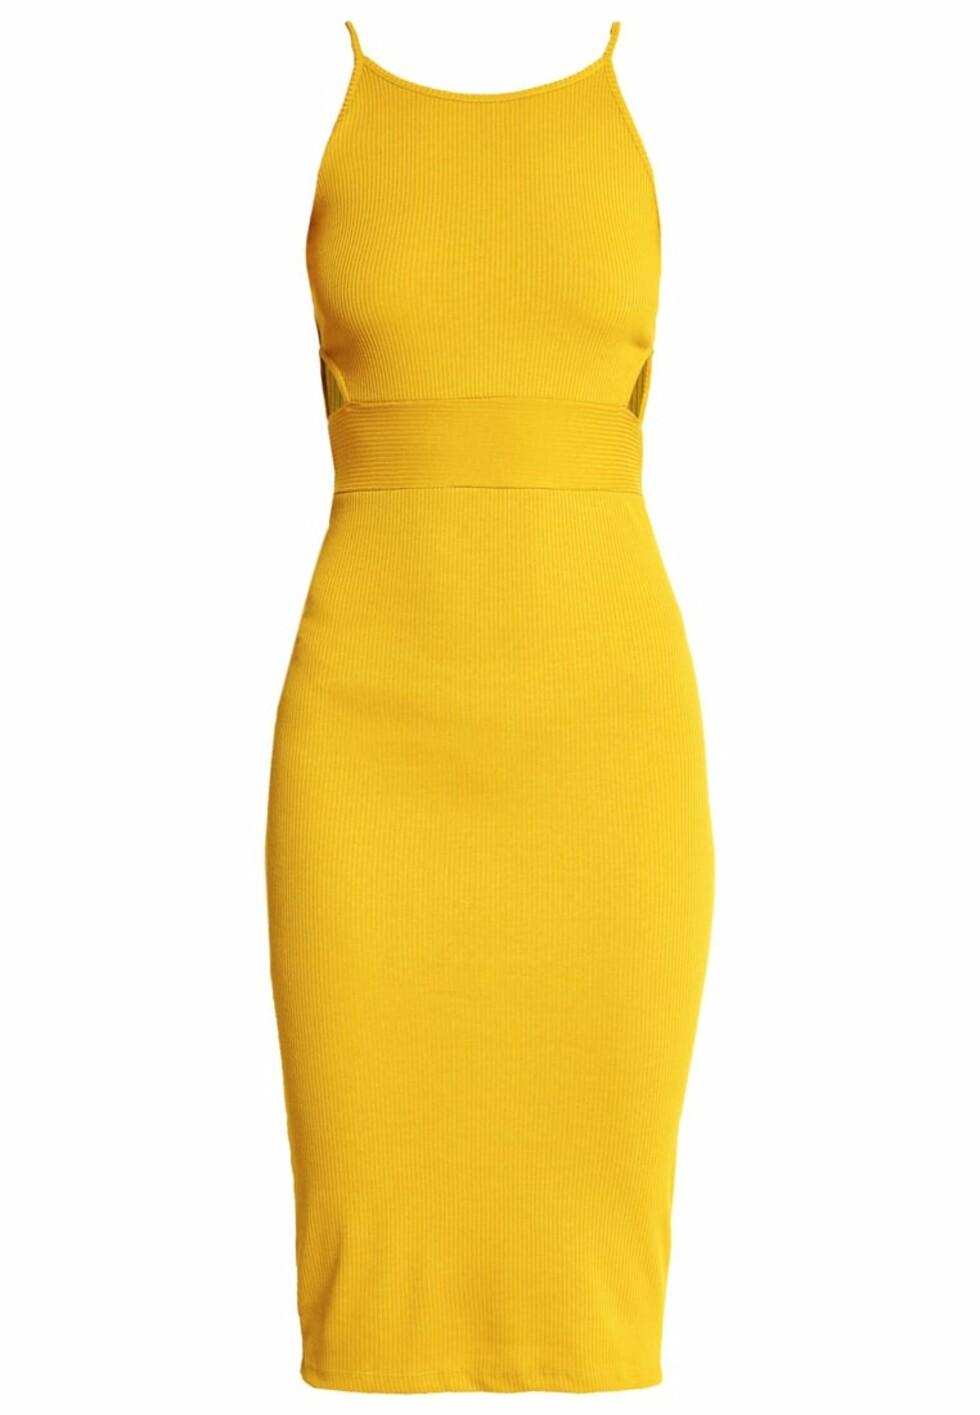 Kjole fra Even&Odd via Zalando.no | kr 249 | pn.zalando.net/go.cgi?pid=1173&wmid=cc&cpid=12&target=http://www.zalando.no/even-odd-jerseykjole-yellow-ev421ca4p-e11.html